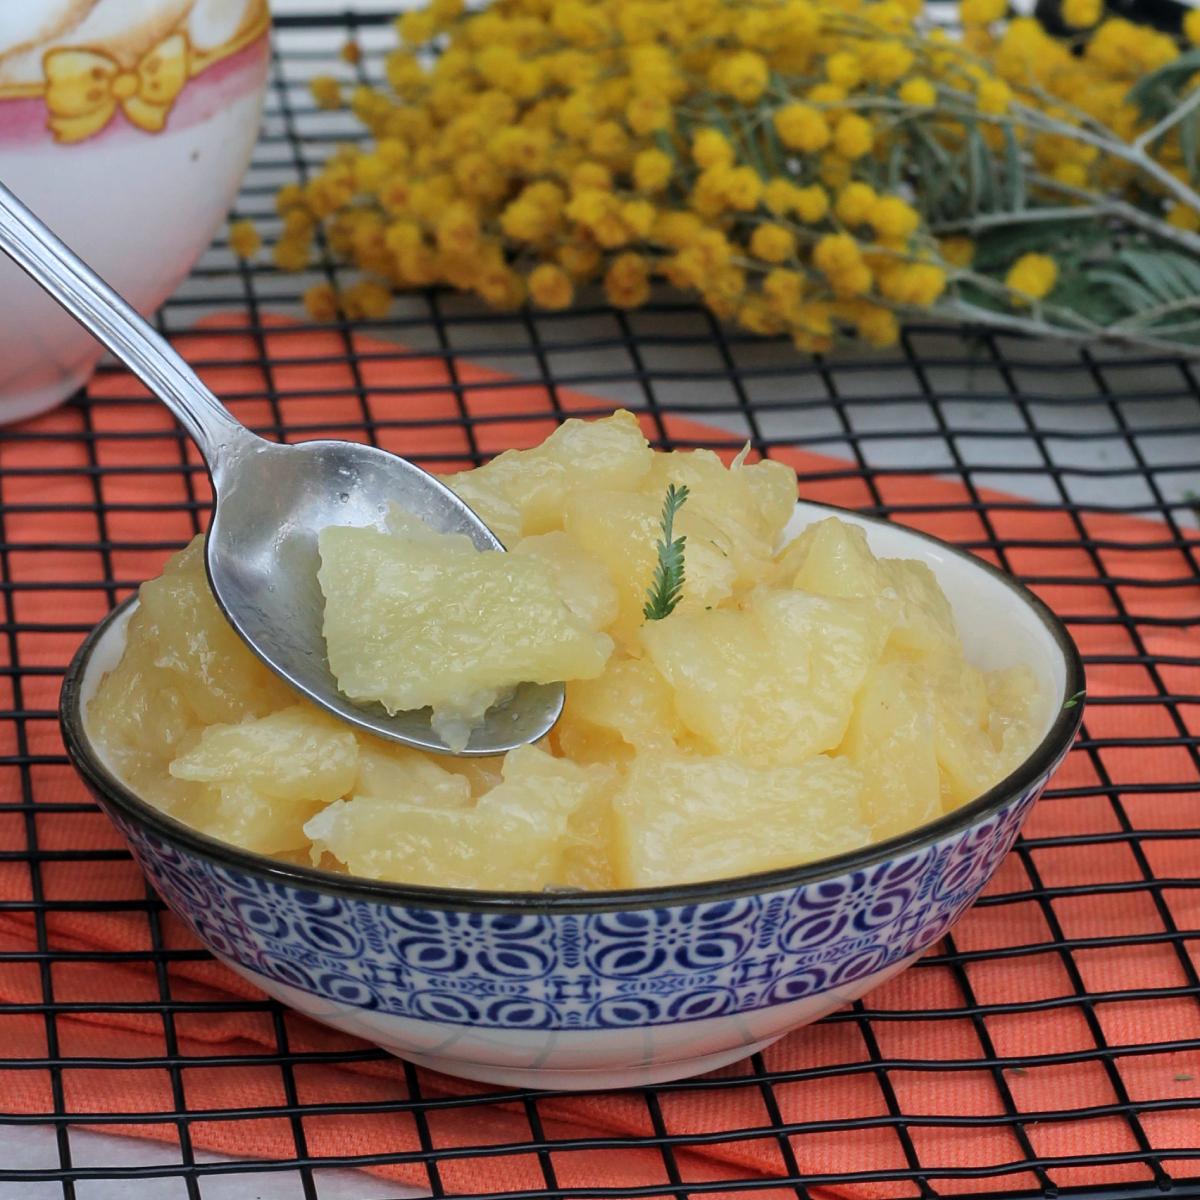 COME FARE ANANAS PER TORTA MIMOSA ricetta base mimosa ananas